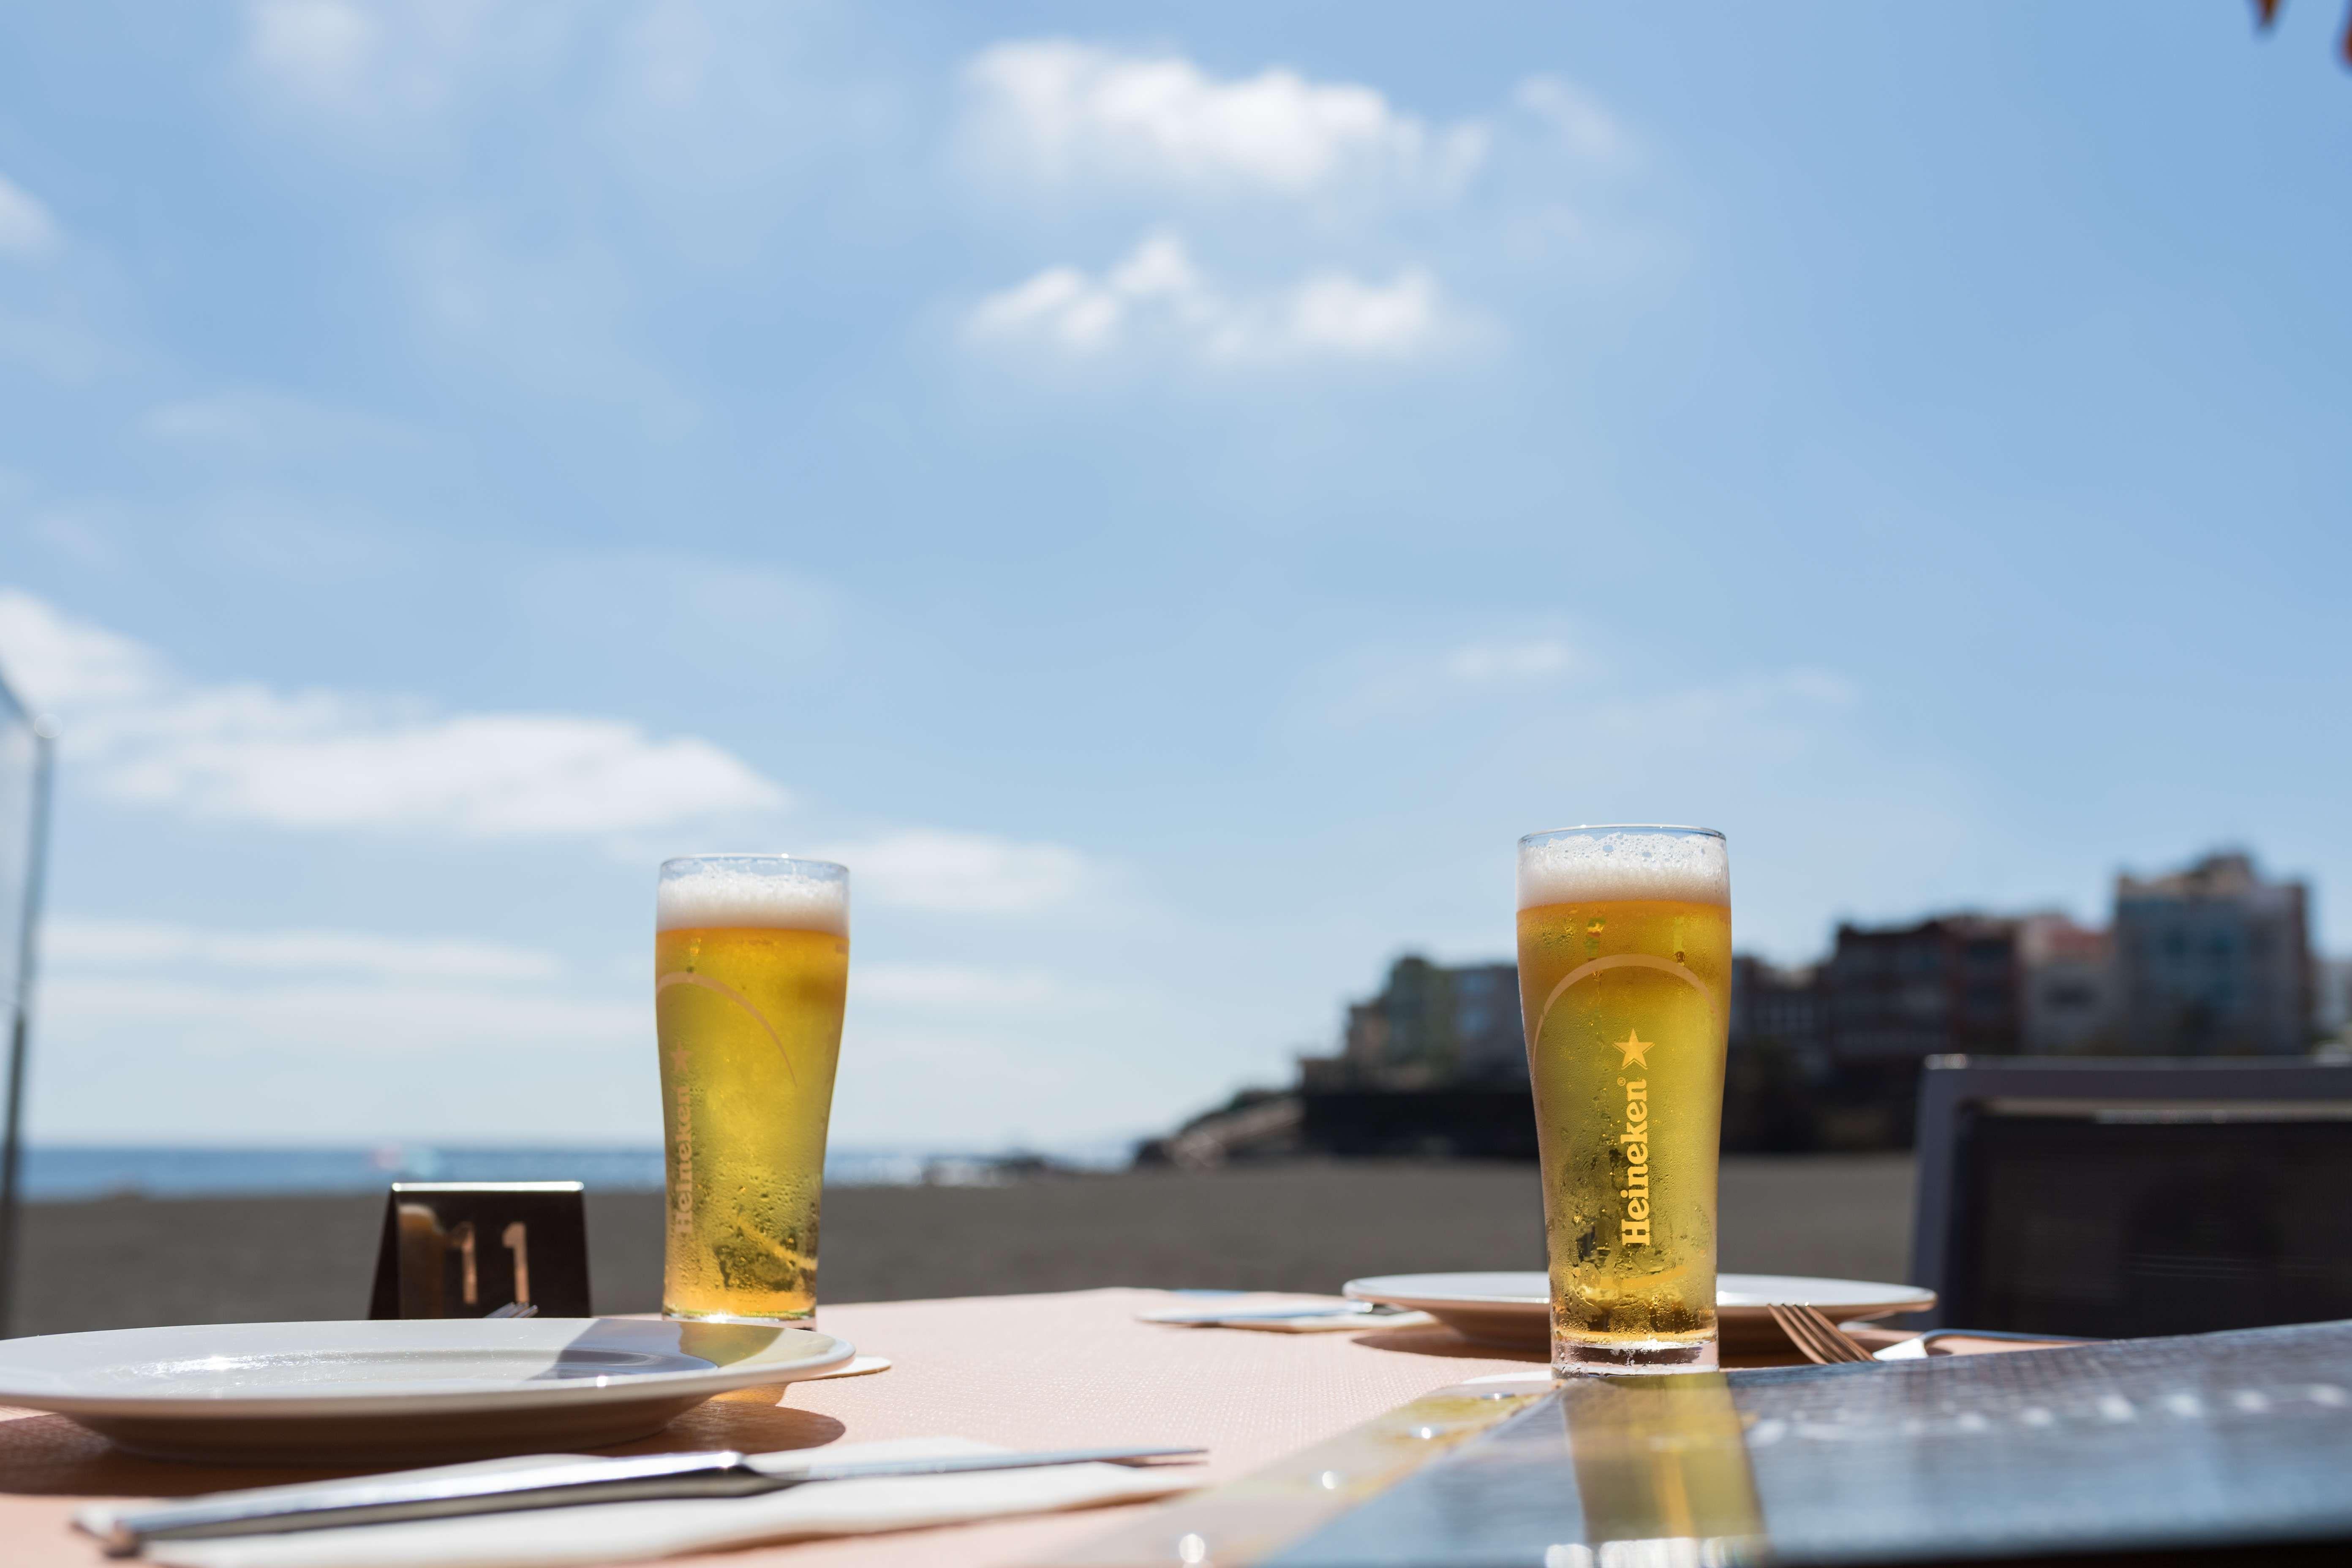 Restaurante italiano en la playa en Telde